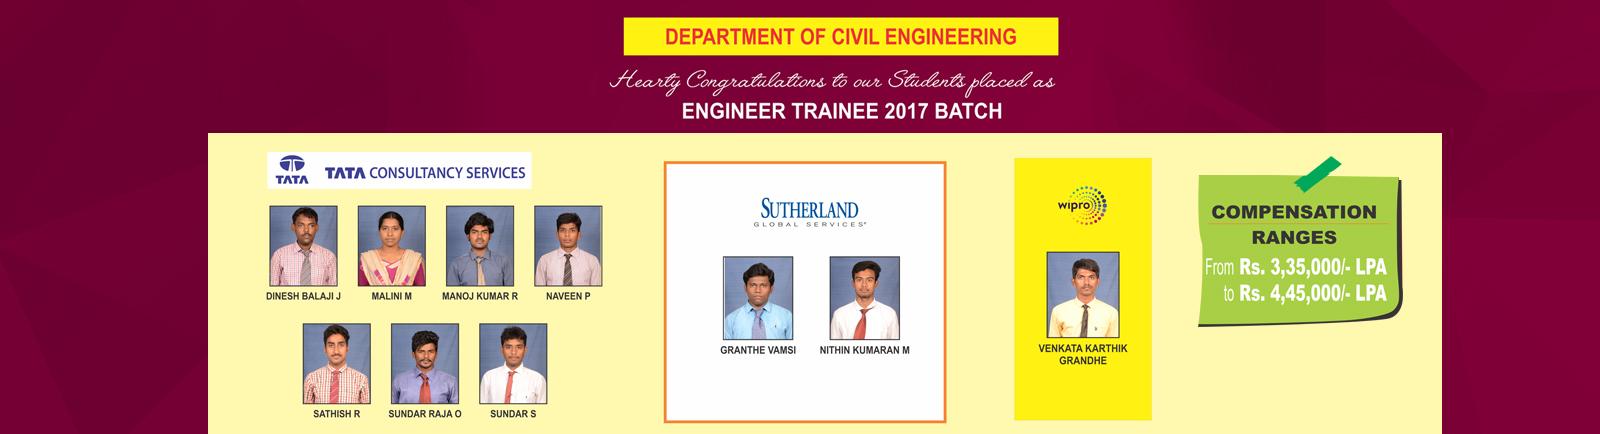 Engineering-Trainee-2017